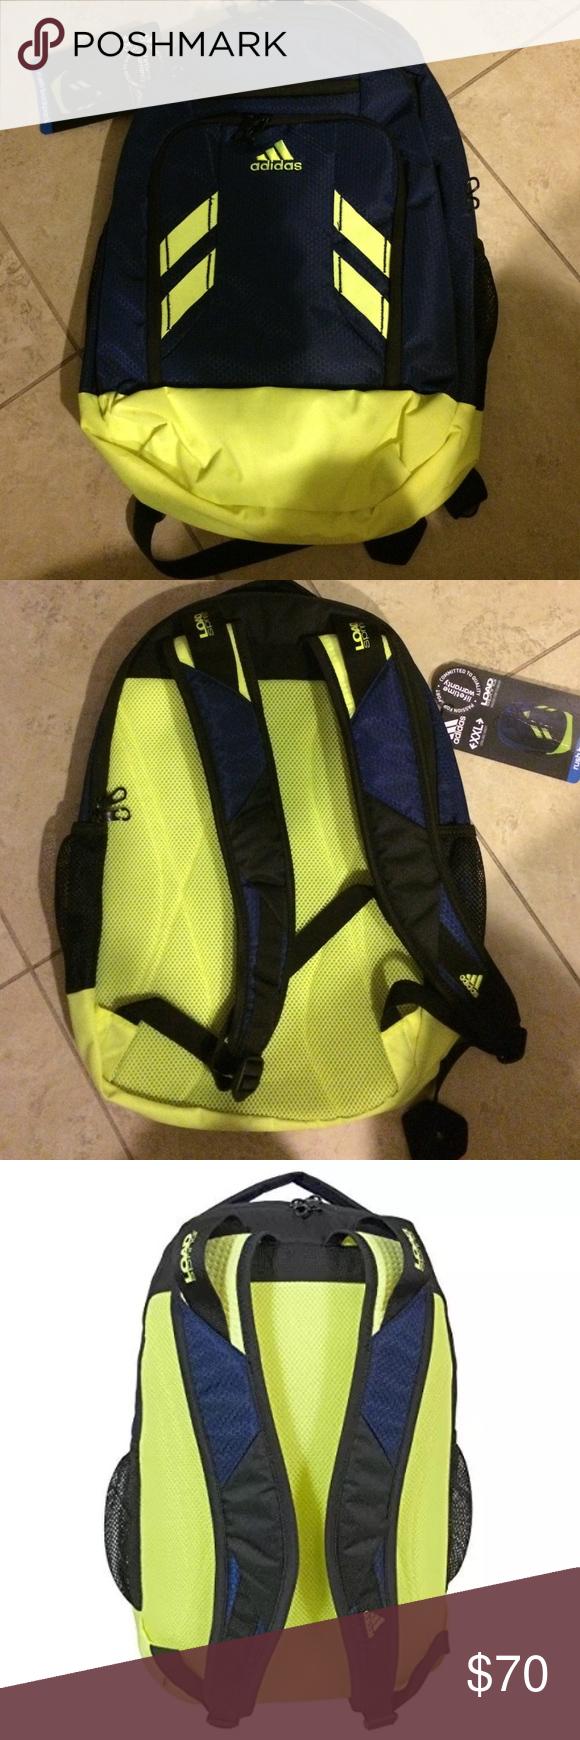 Adidas XXL Rush Backpack NWT Adidas XXL Rush Backpack NWT Adidas Bags  Backpacks f55663634a68e